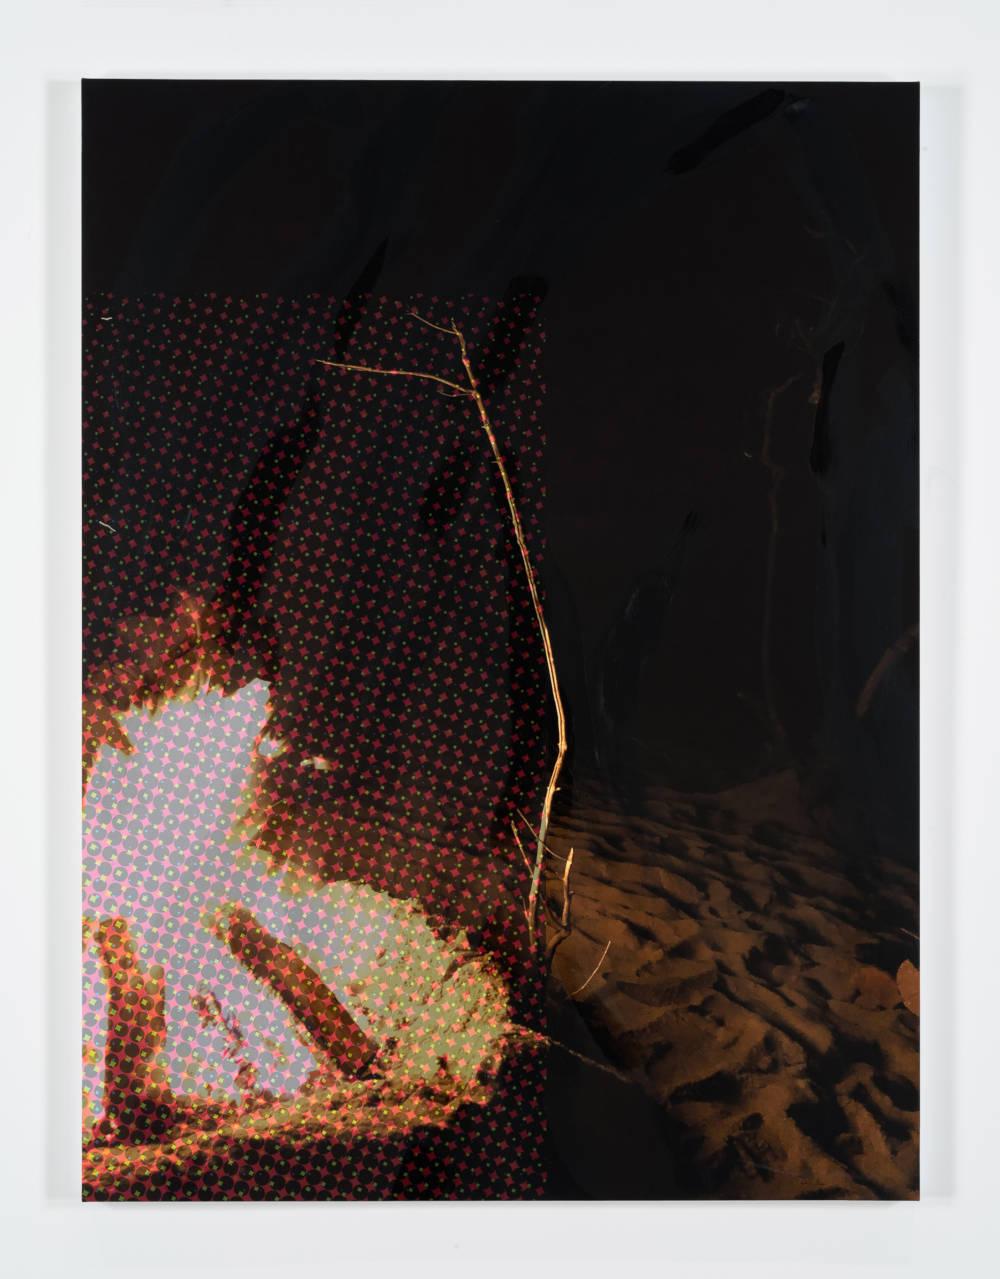 The Bonfire 4